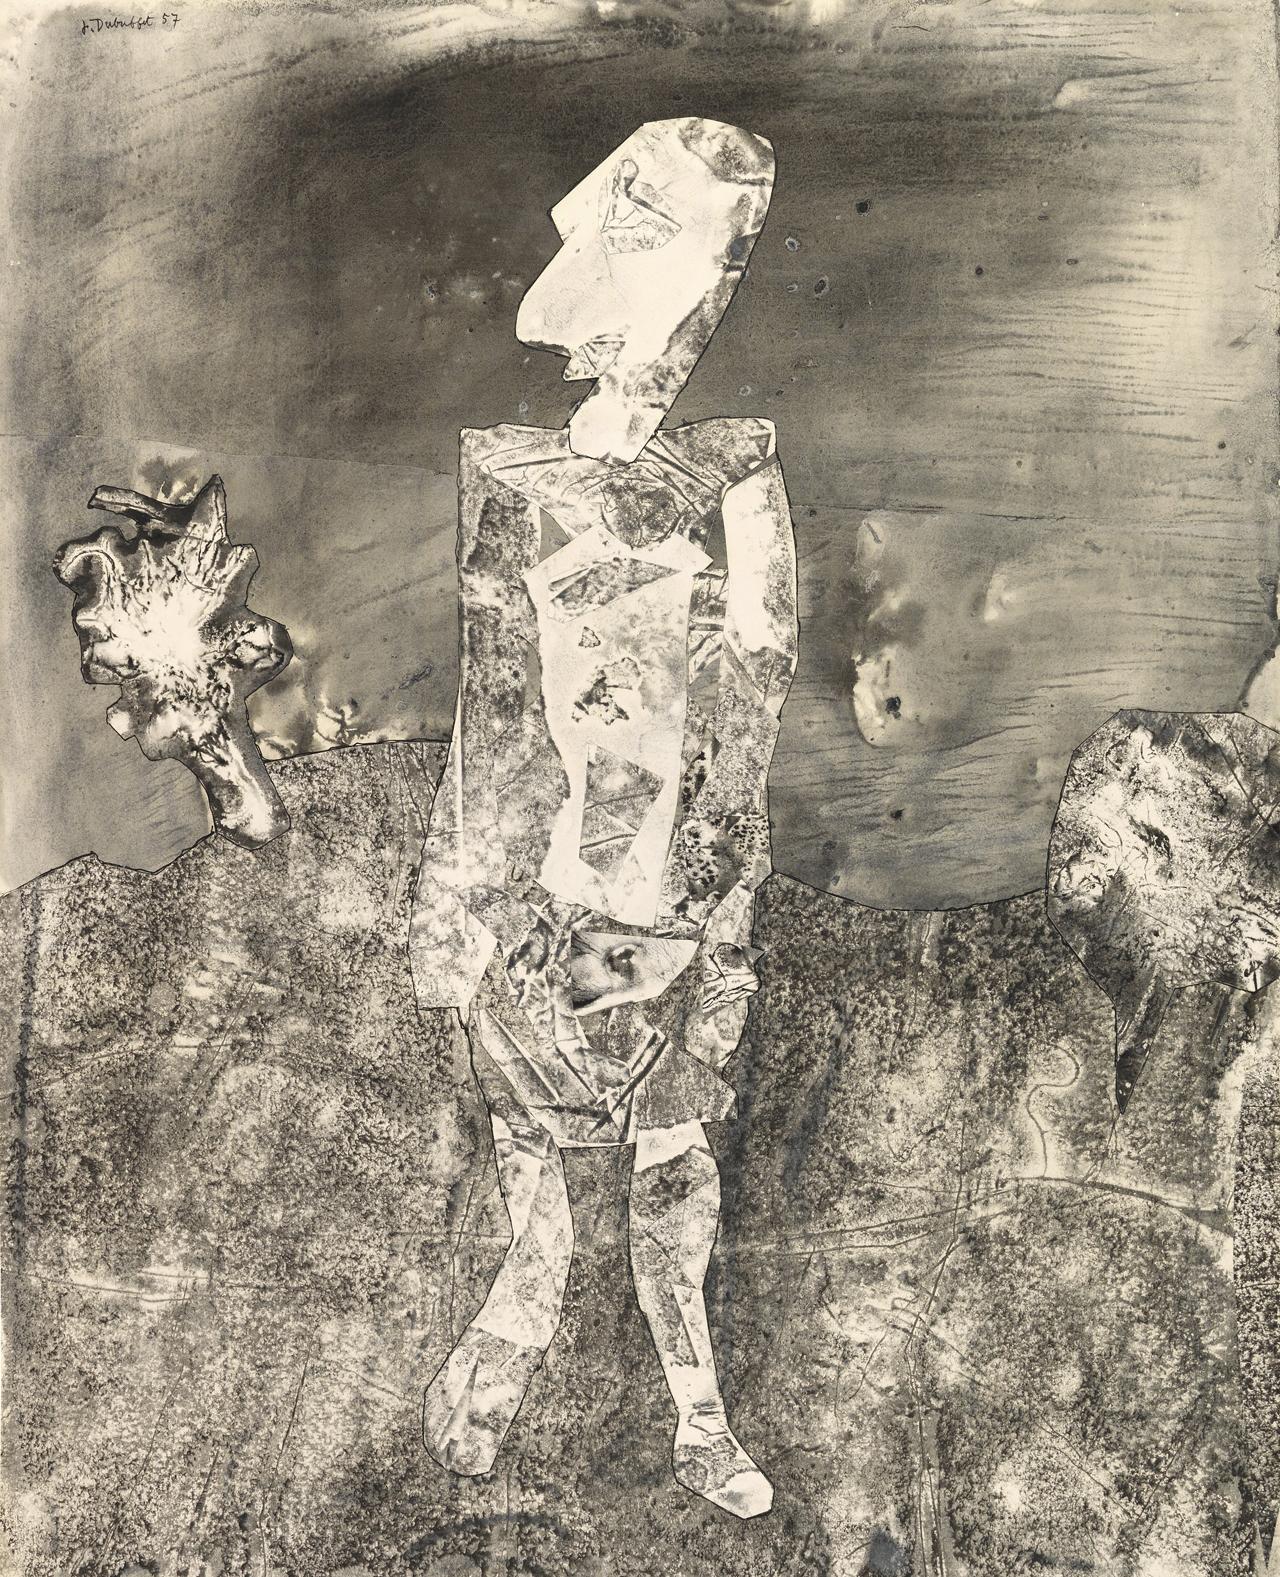 Jean Dubuffet, Promeneur au regard pâle, 1957, Assemblage mit Monotypie und Gouache auf Papier, 81 x 65,5 cm